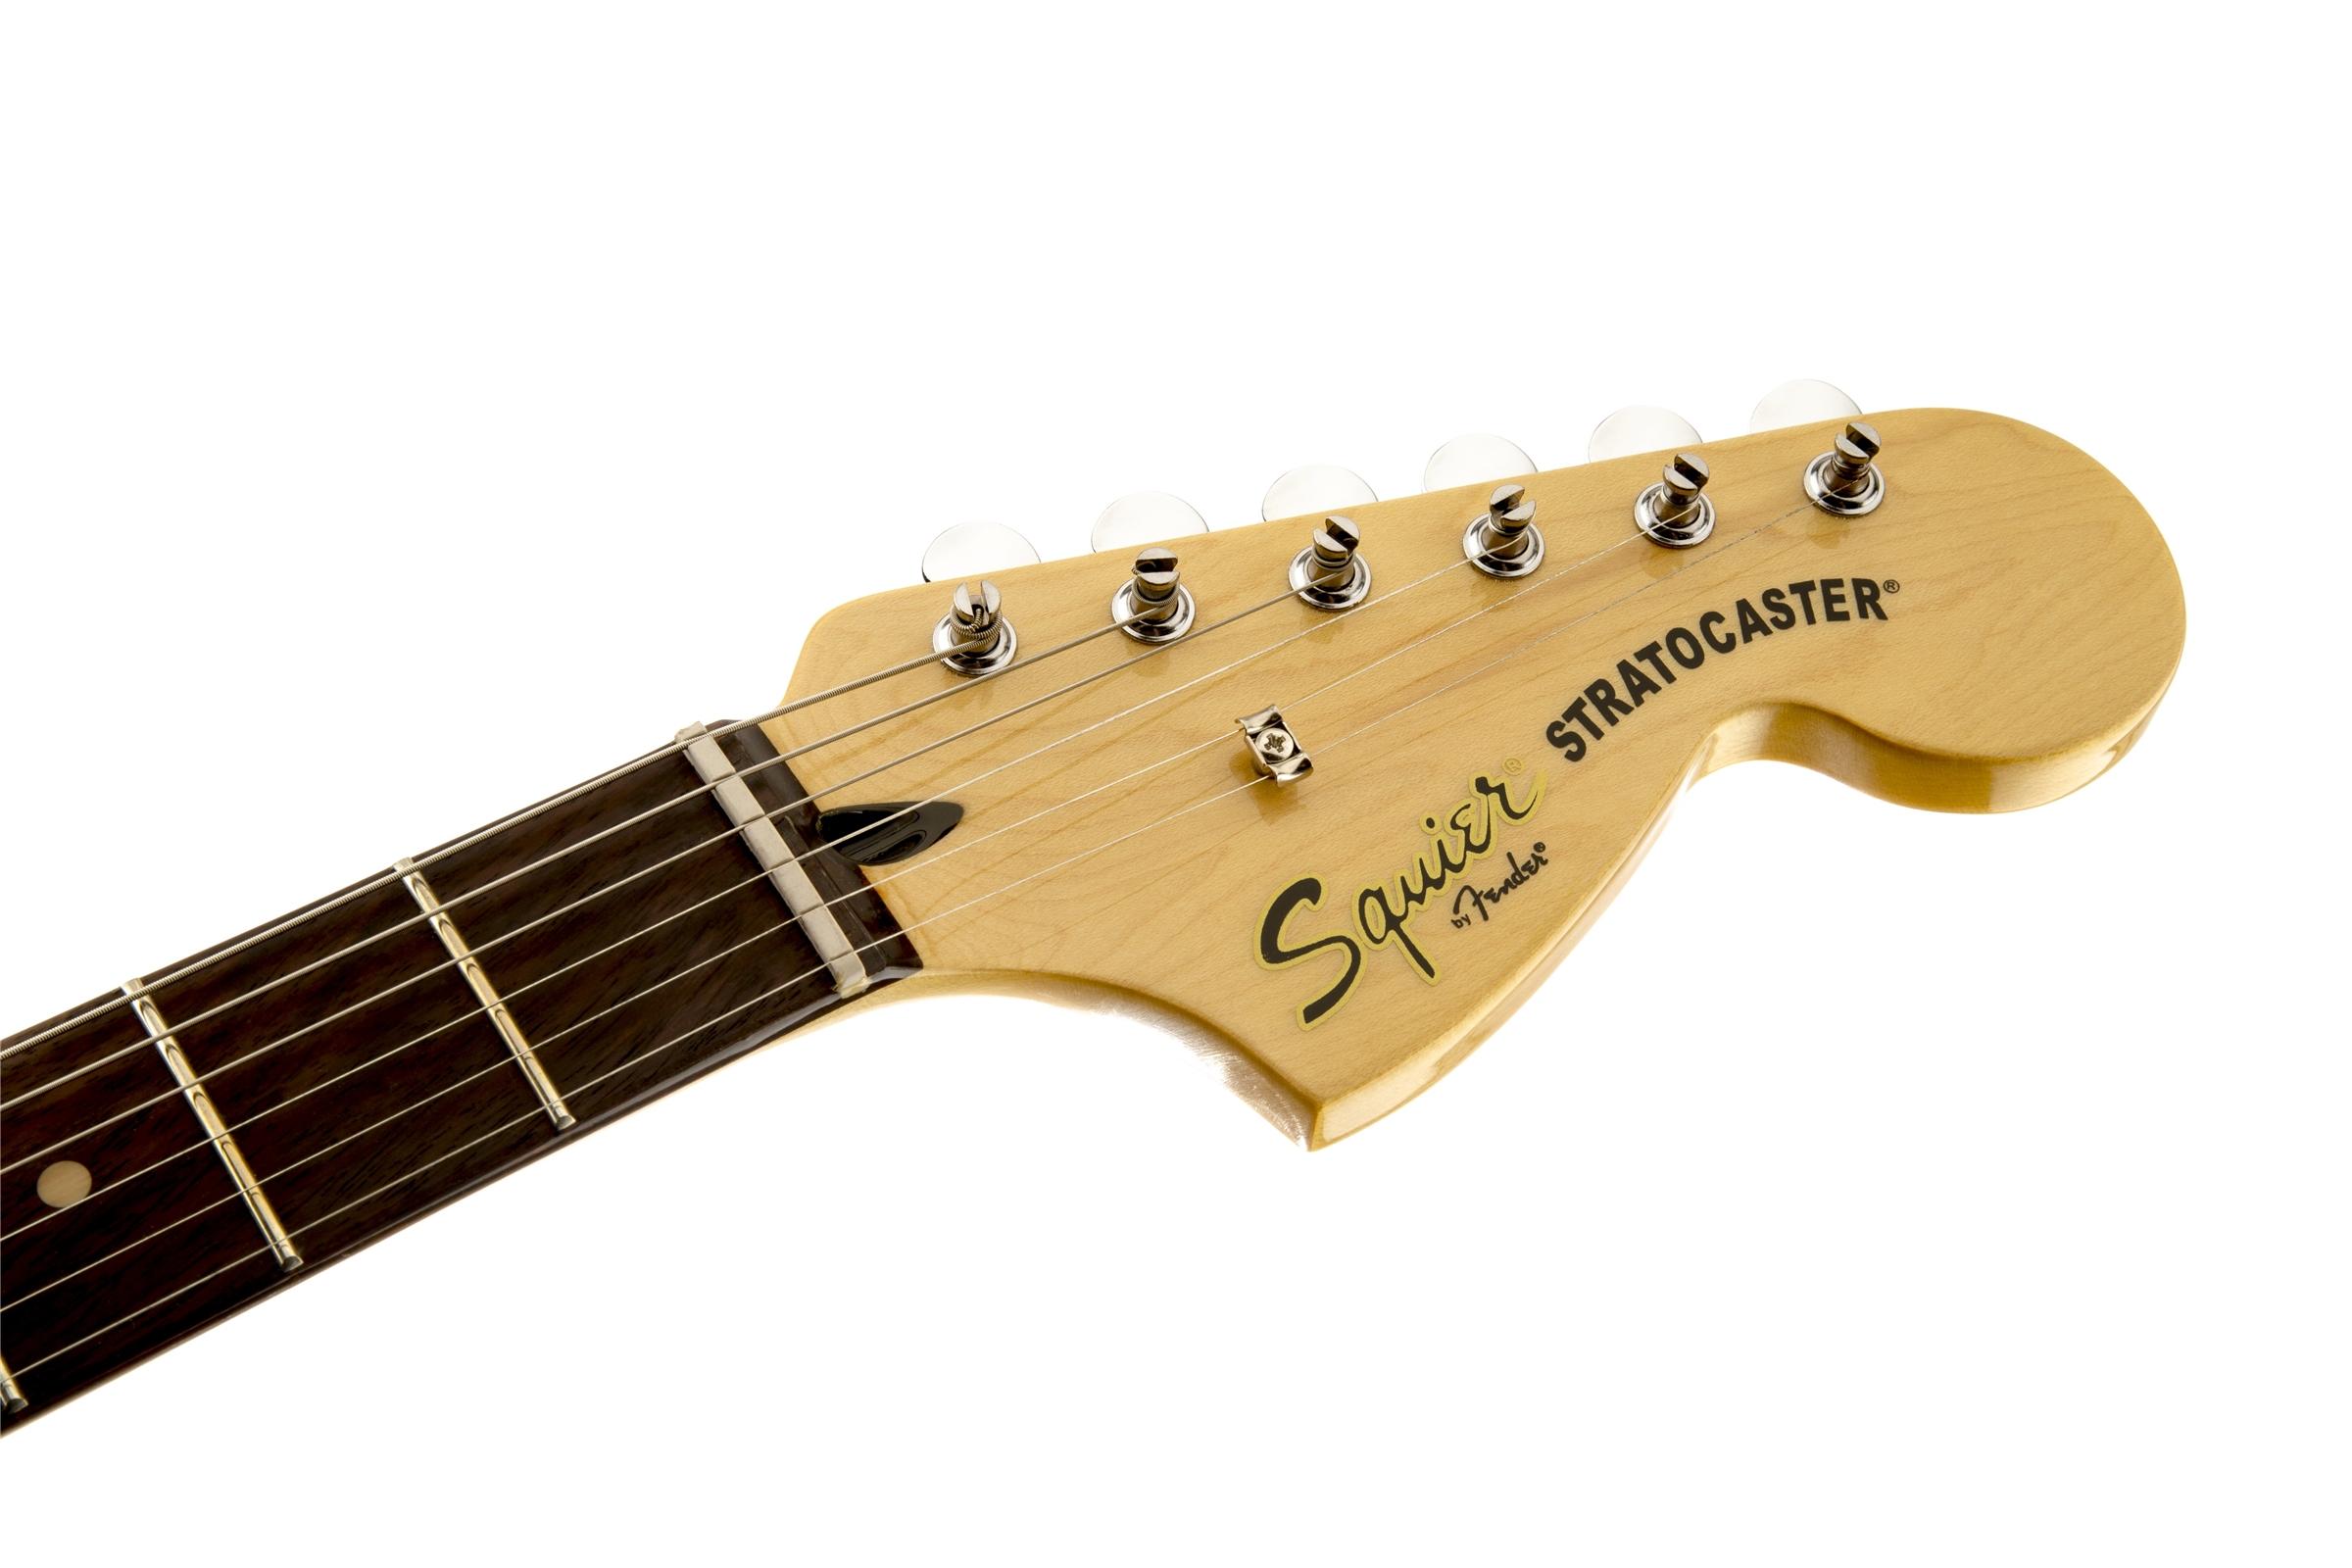 vintage modified stratocaster squier electric guitars. Black Bedroom Furniture Sets. Home Design Ideas